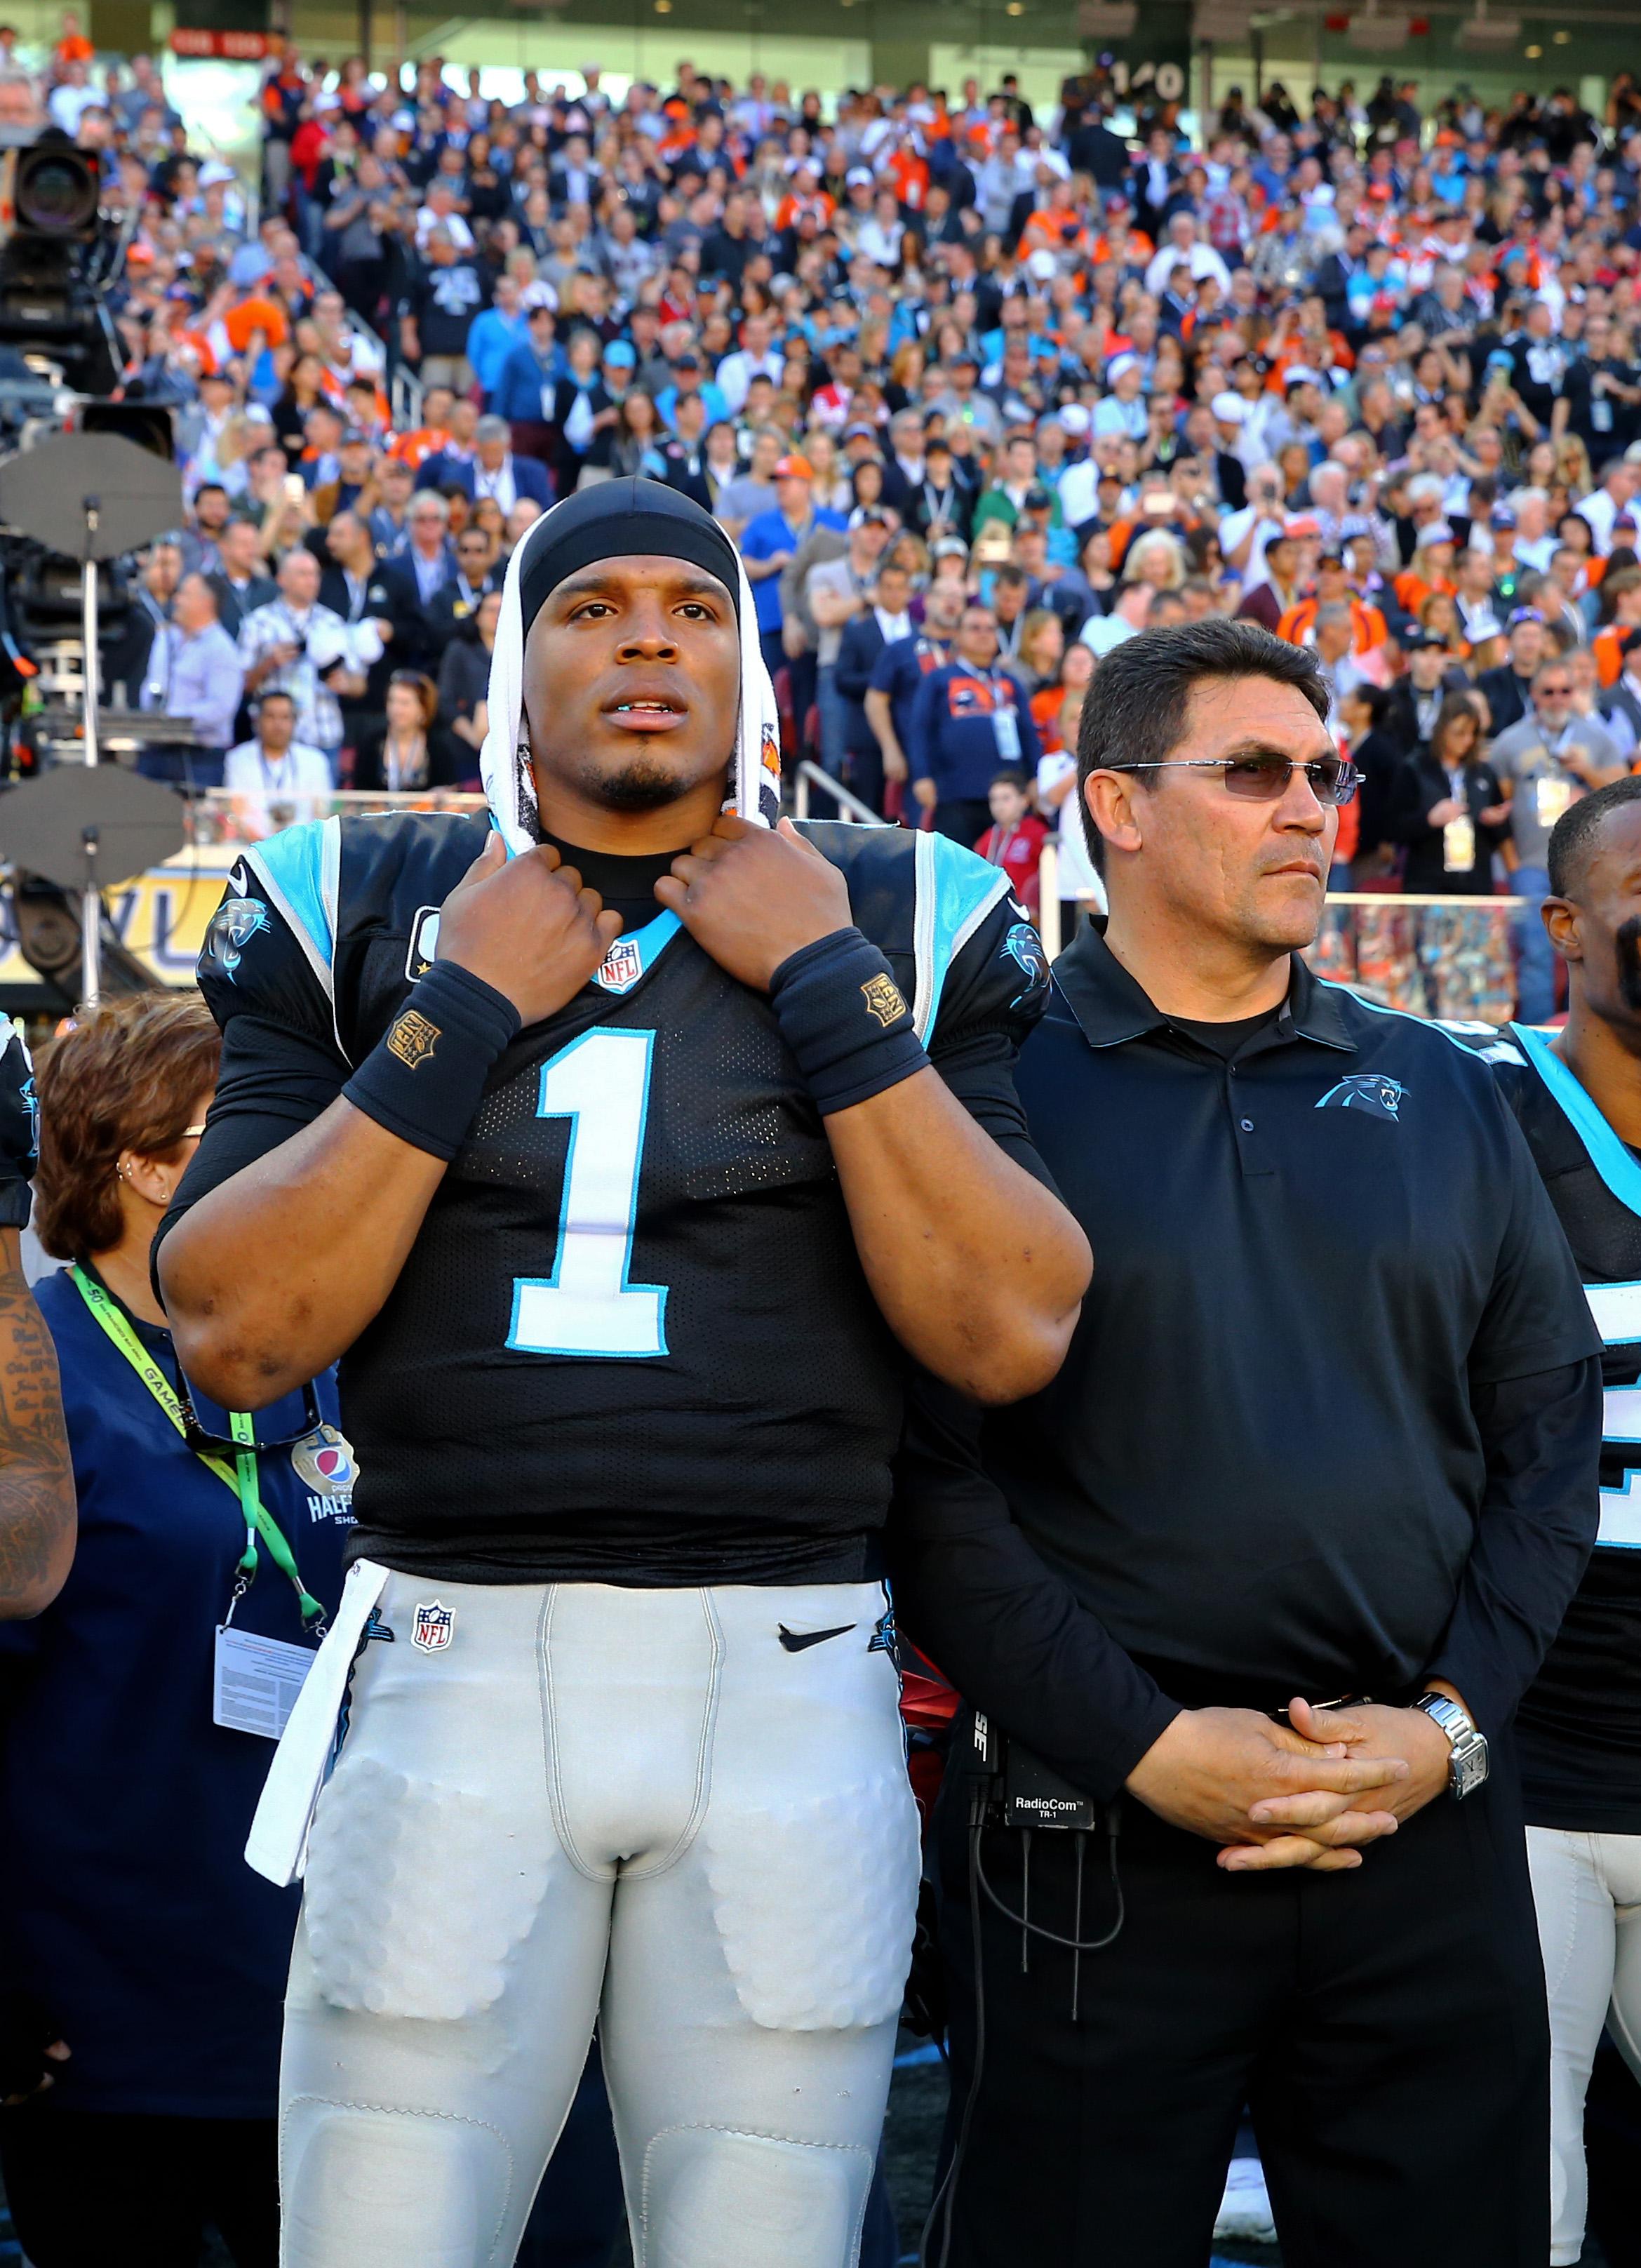 Carolina Panthers QB Cam Newton and HC Ron Rivera during Super Bowl 50 against the Denver Broncos, Feb. 7, 2016.